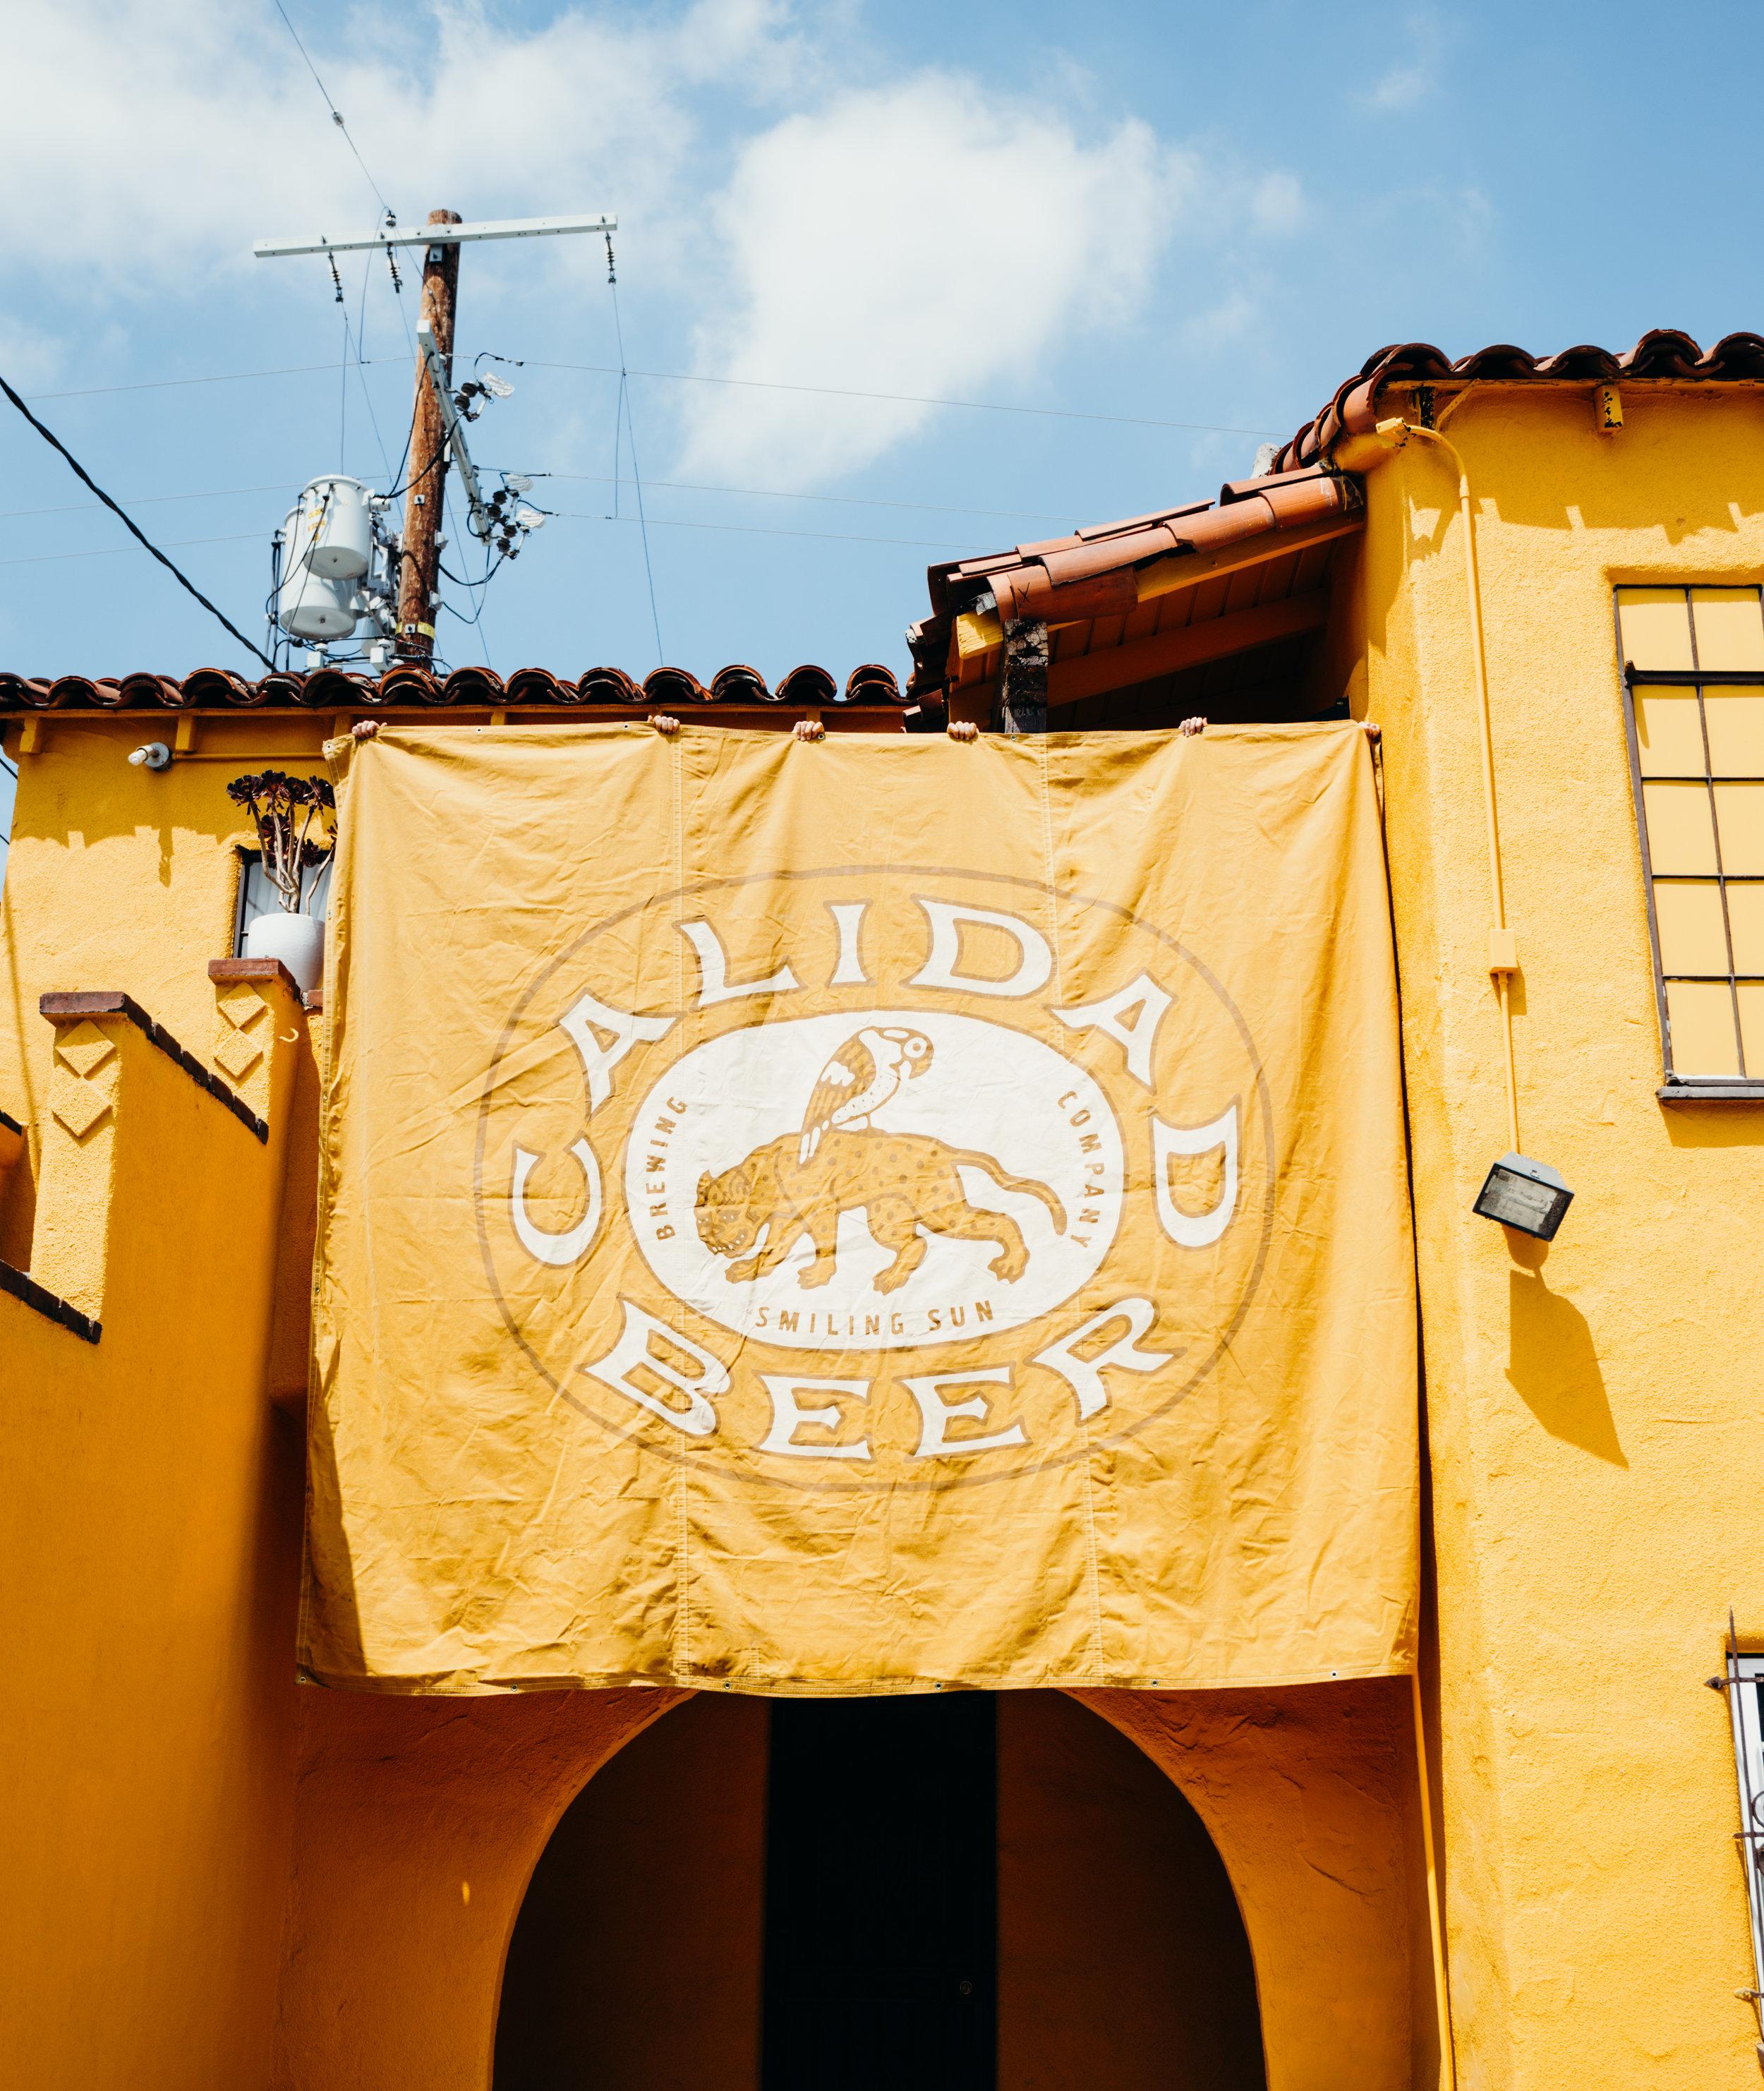 Casa de Calidad - The fiesta you've been waiting for.